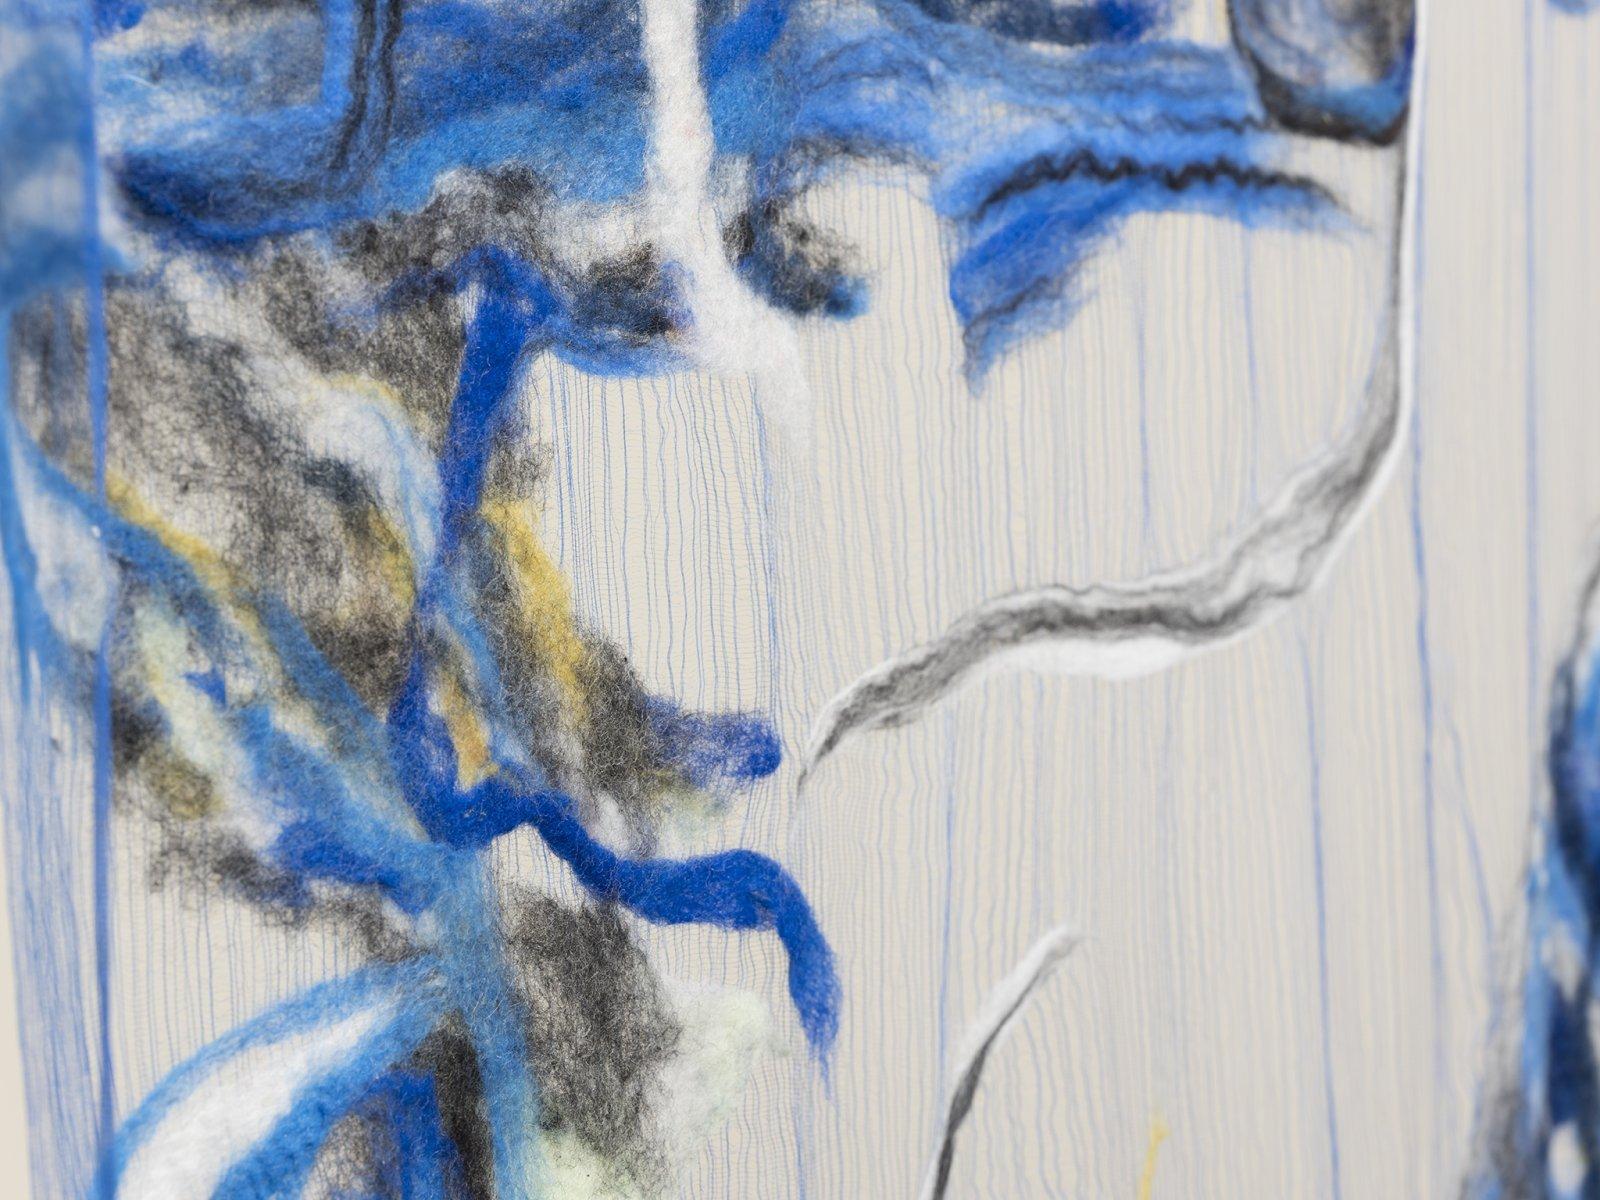 Rebecca Brewer, Scrim: Dagger (detail), 2019, silk gauze, wool, ball chain, alligator clips, 132 x 45 in. (335 x 113 cm)